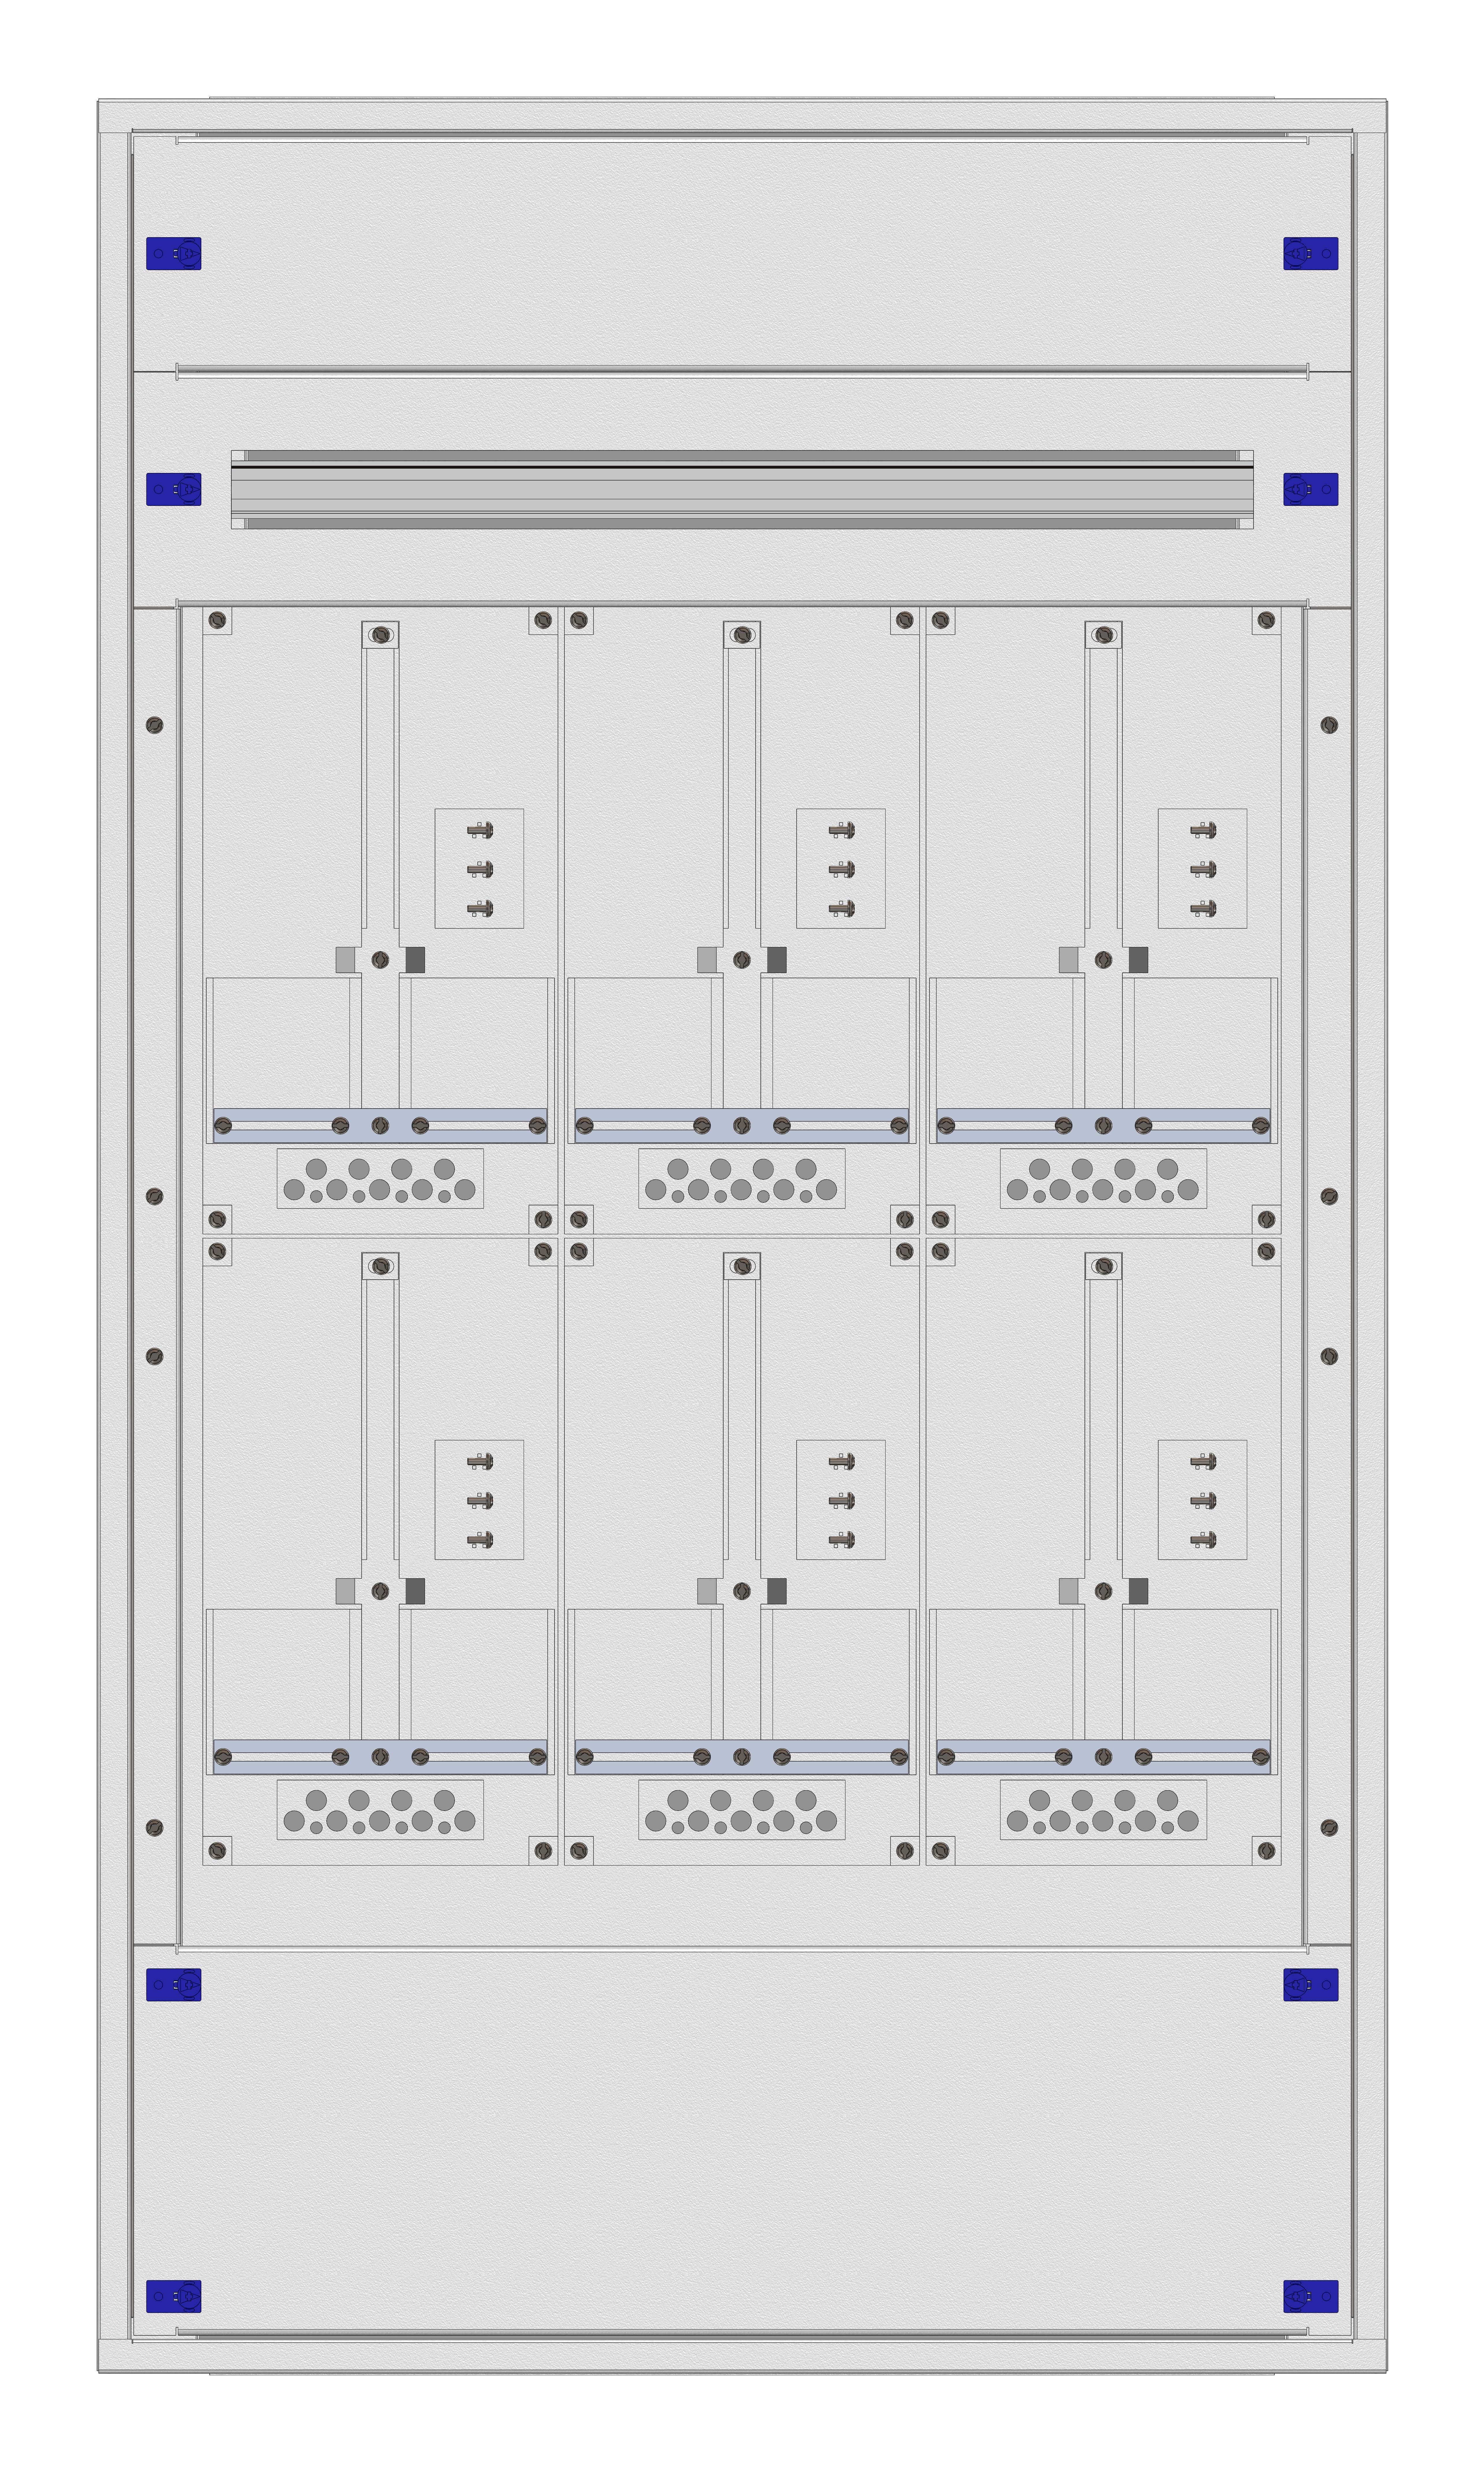 1 Stk Aufputz-Zählerverteiler 3A-28G/TIR 6ZP, H1380B810T250mm IL162328TS